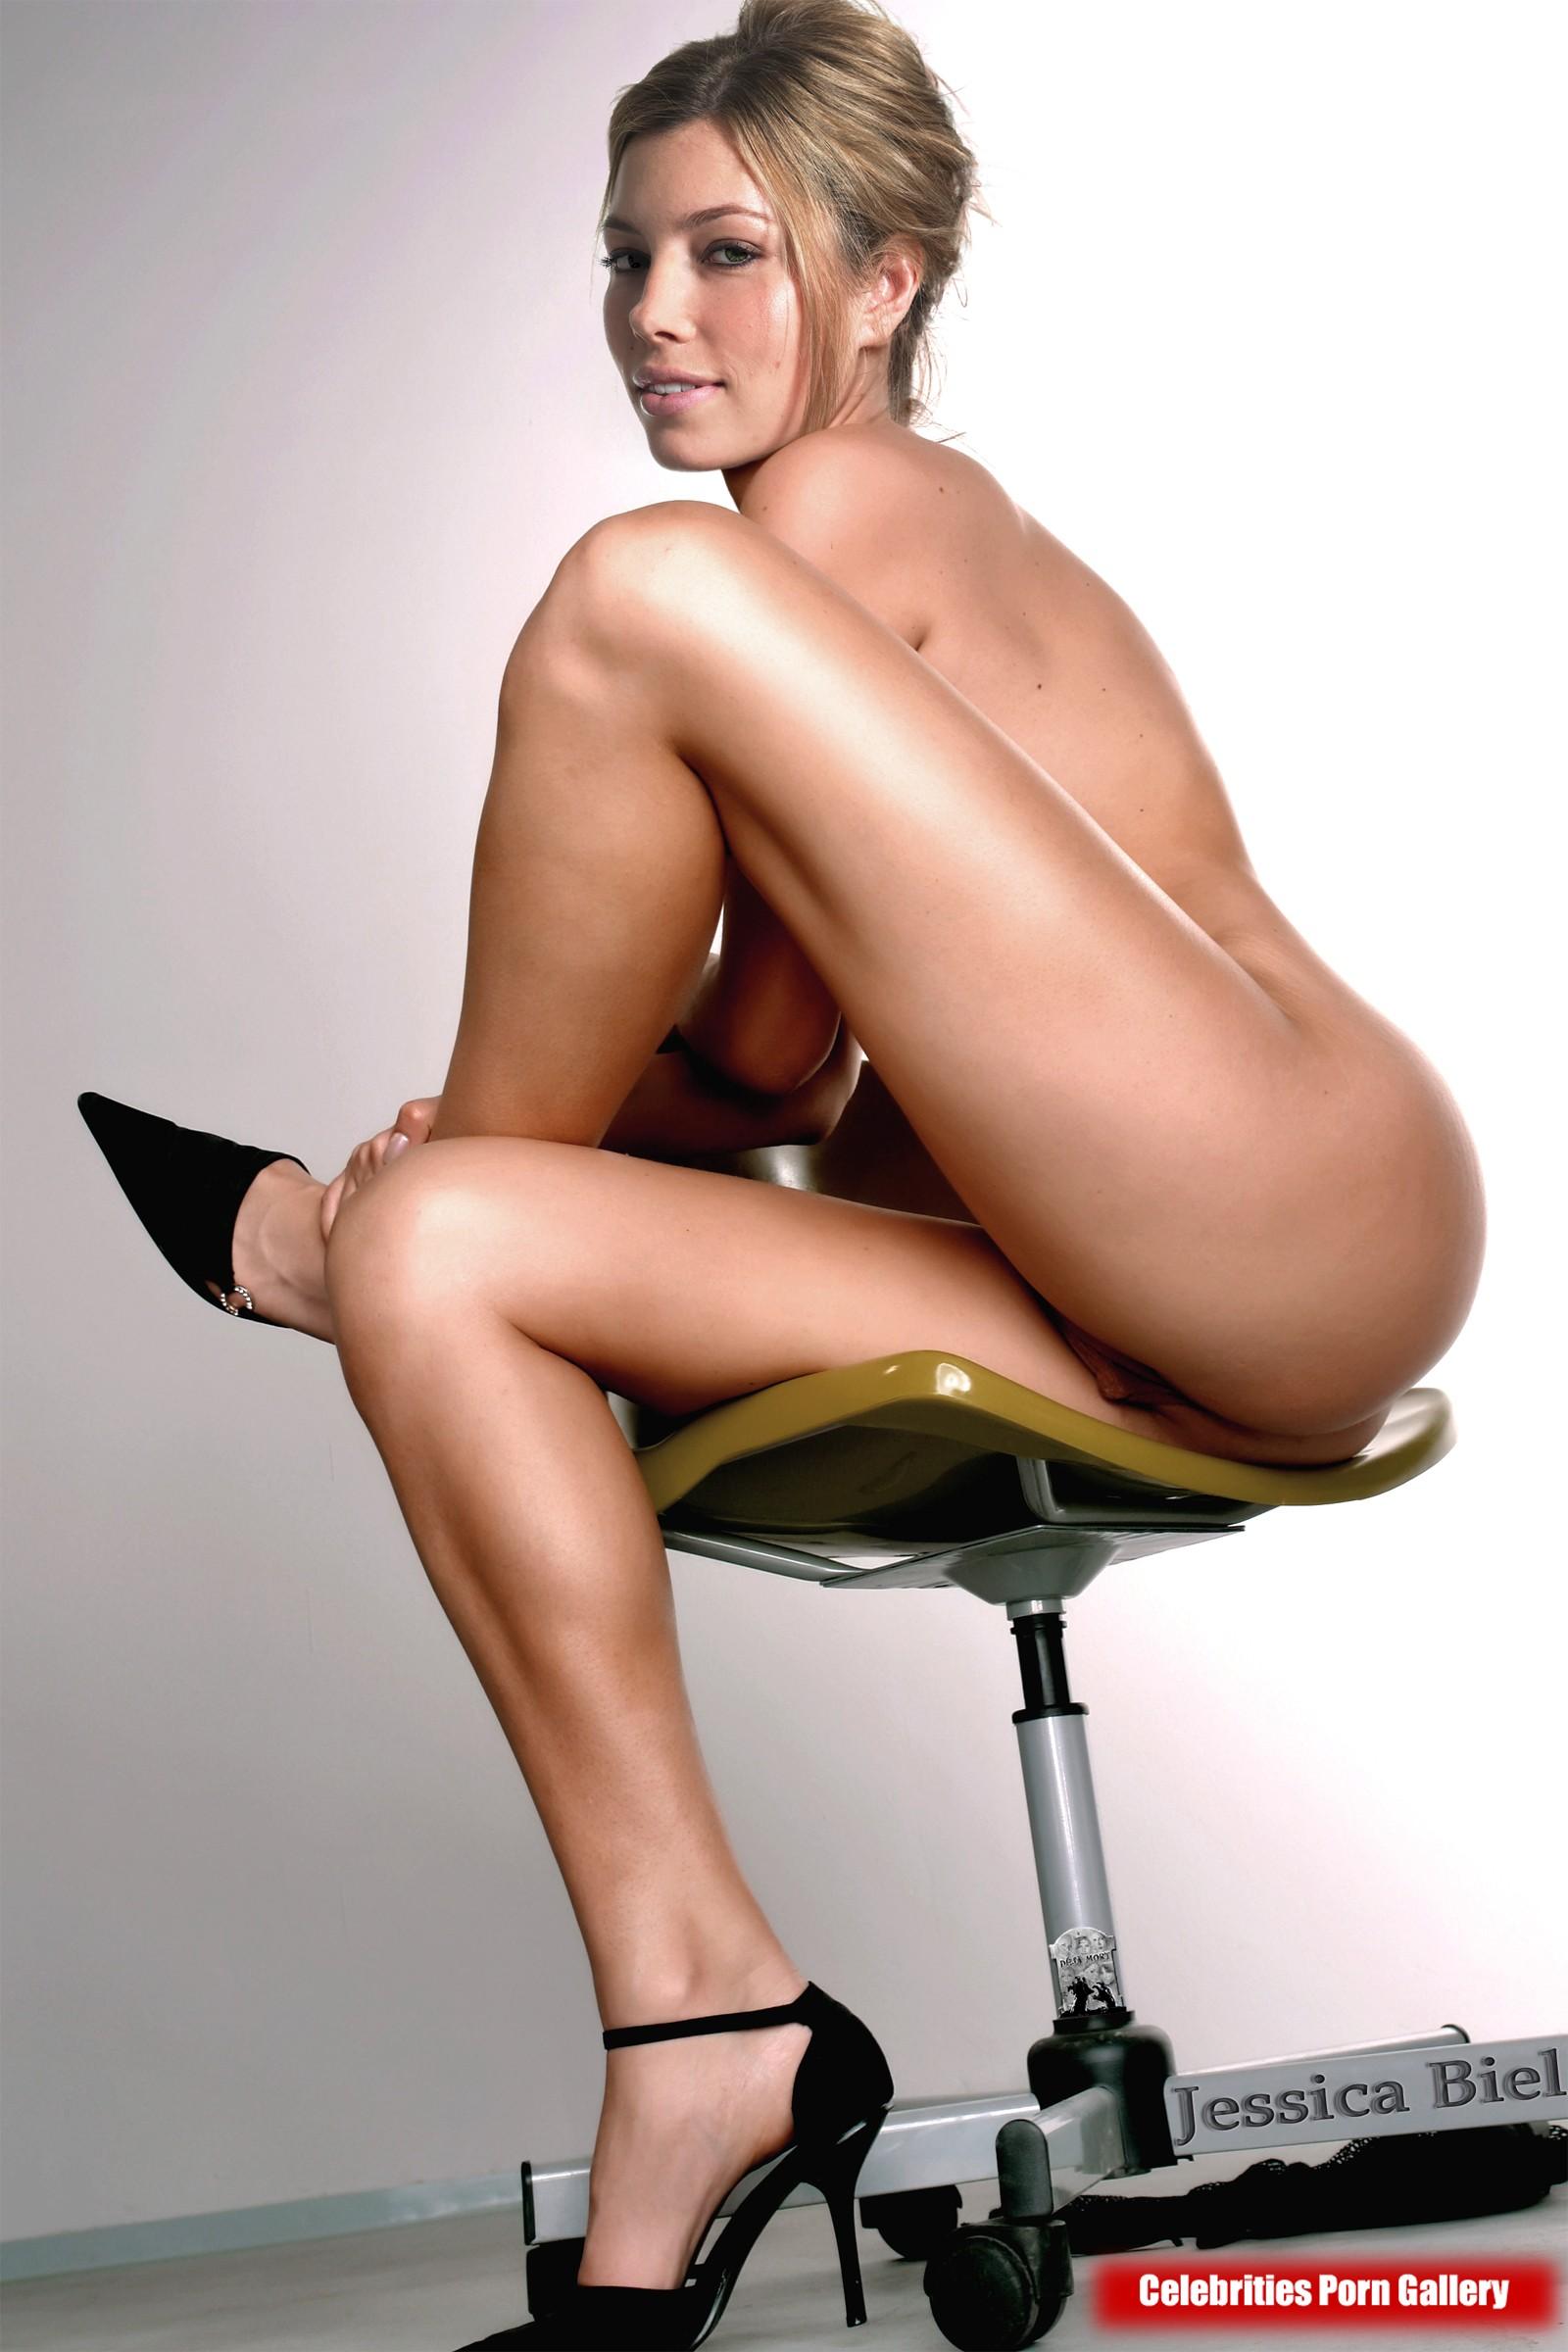 Jessica Biel Nude Powder Blue